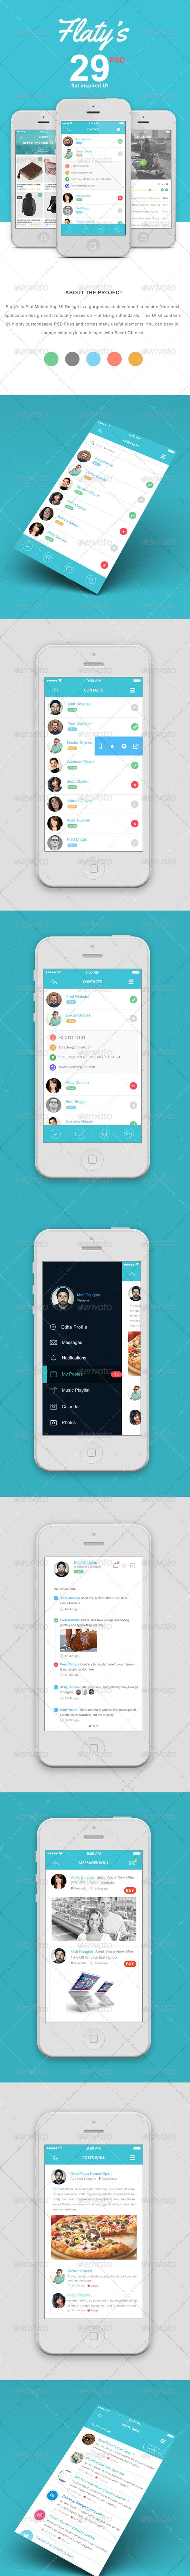 Flat Mobile App UI Design - User Interfaces Web Elements